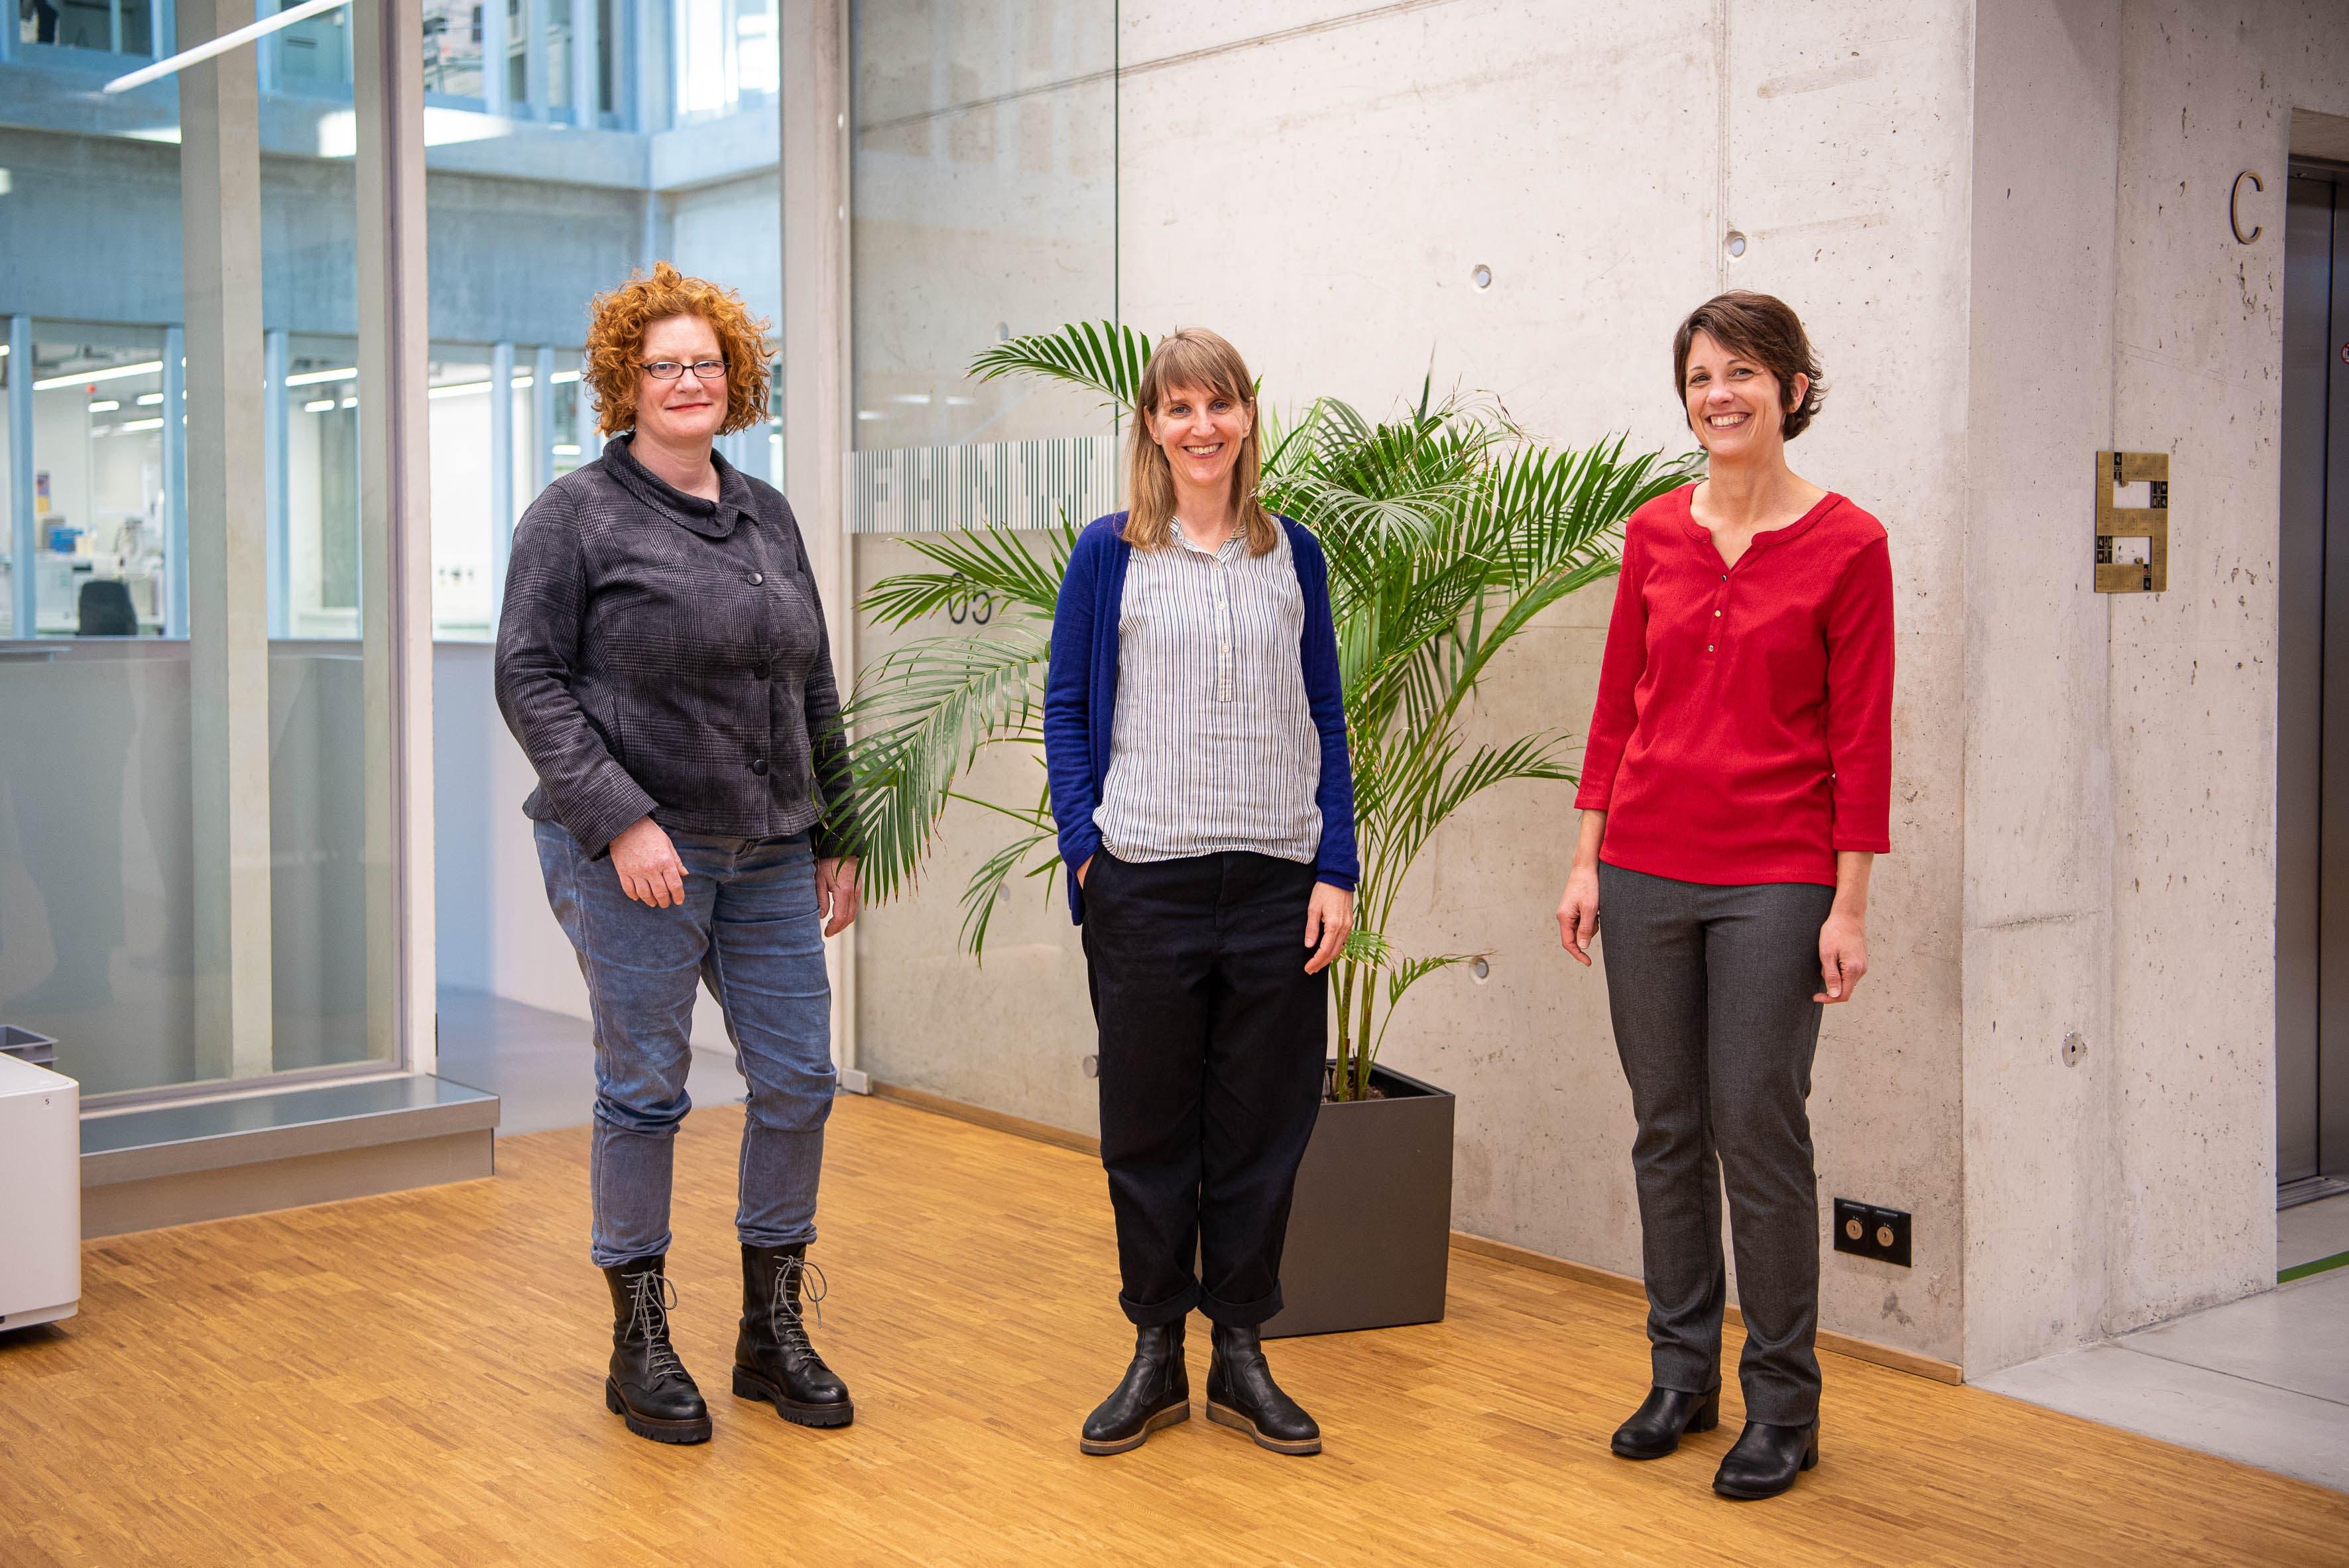 Das Leitungsteam des Projekts E-Inclusion: v.l.n.r Anja Blechschmidt, Claire Reymond und Simone Hemm-Ode (Projektleitung).